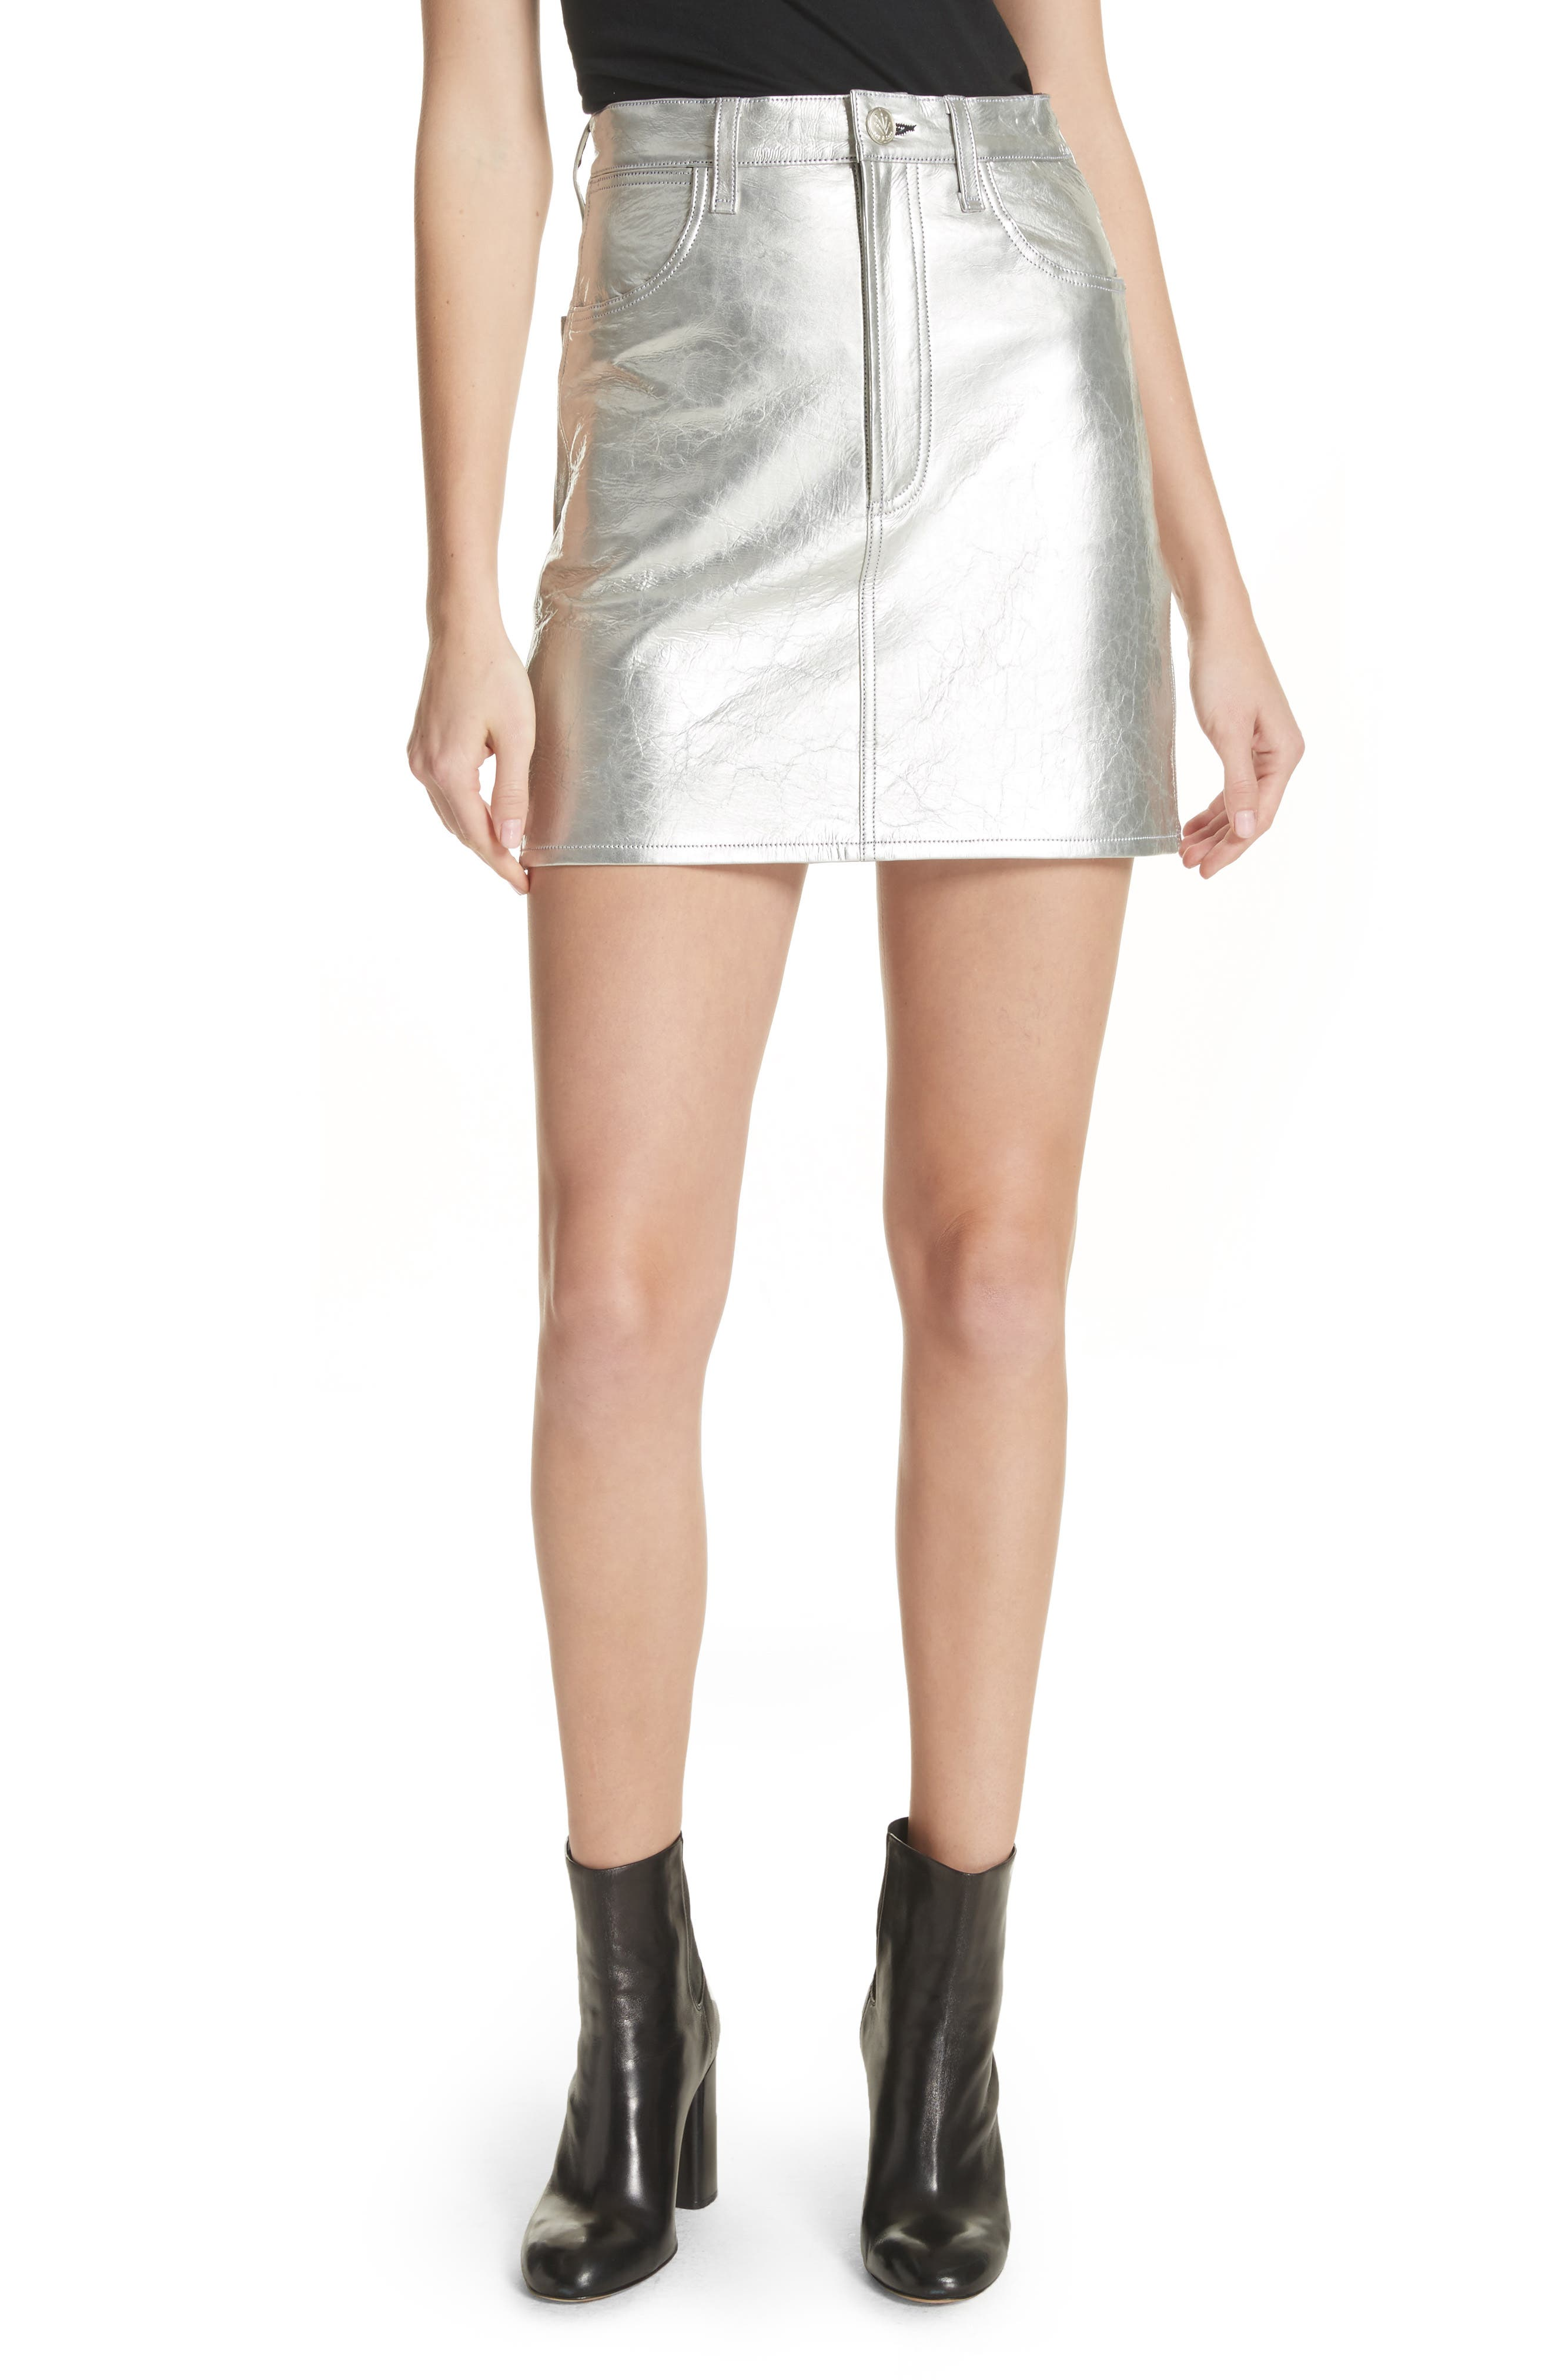 Moss High Waist Leather Miniskirt,                             Main thumbnail 1, color,